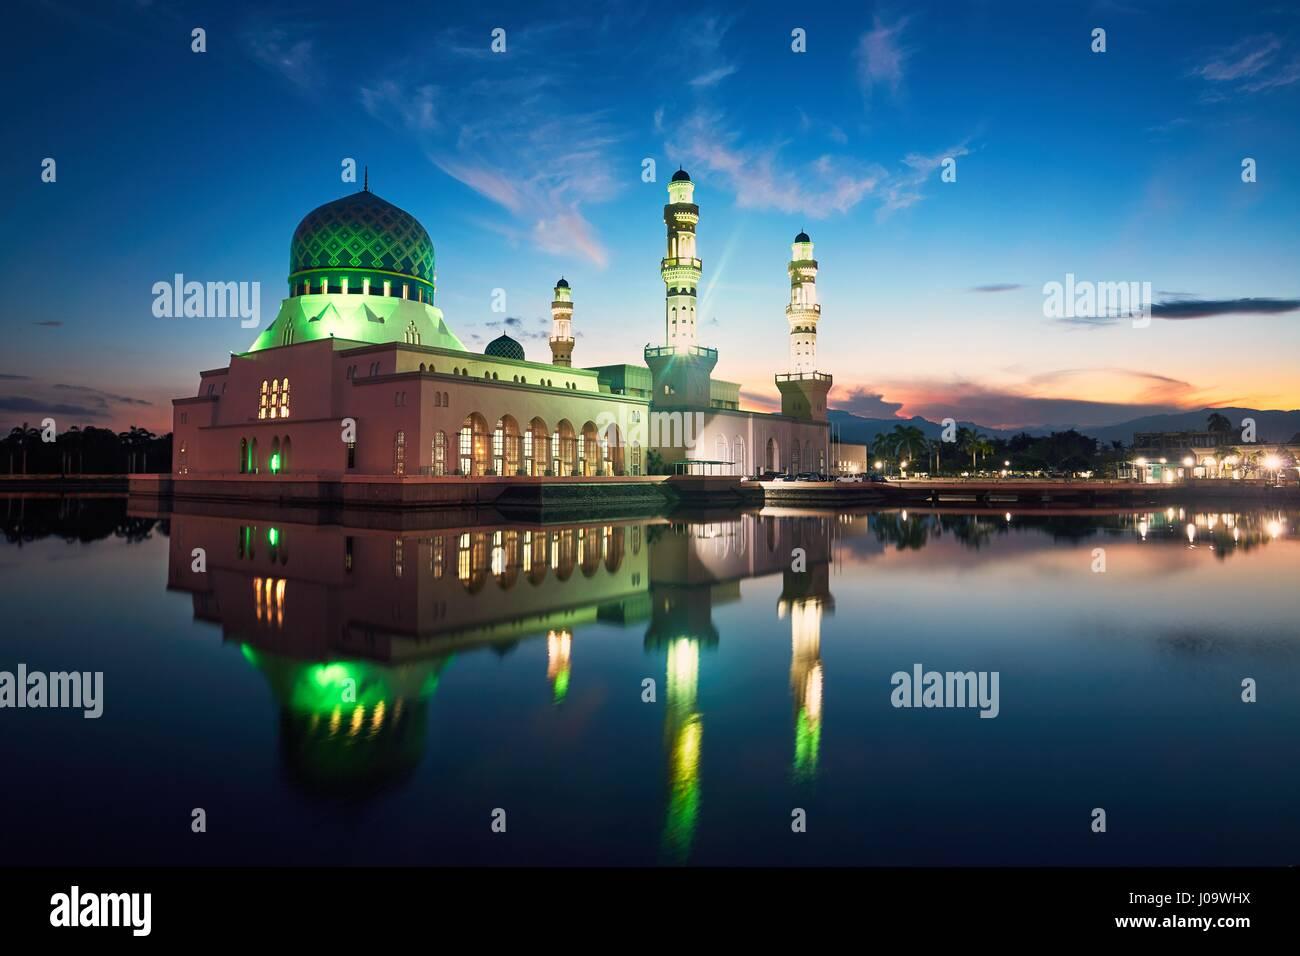 Reflexion von Kota Kinabalu Stadt Moschee, Insel Borneo, Malaysia Stockbild